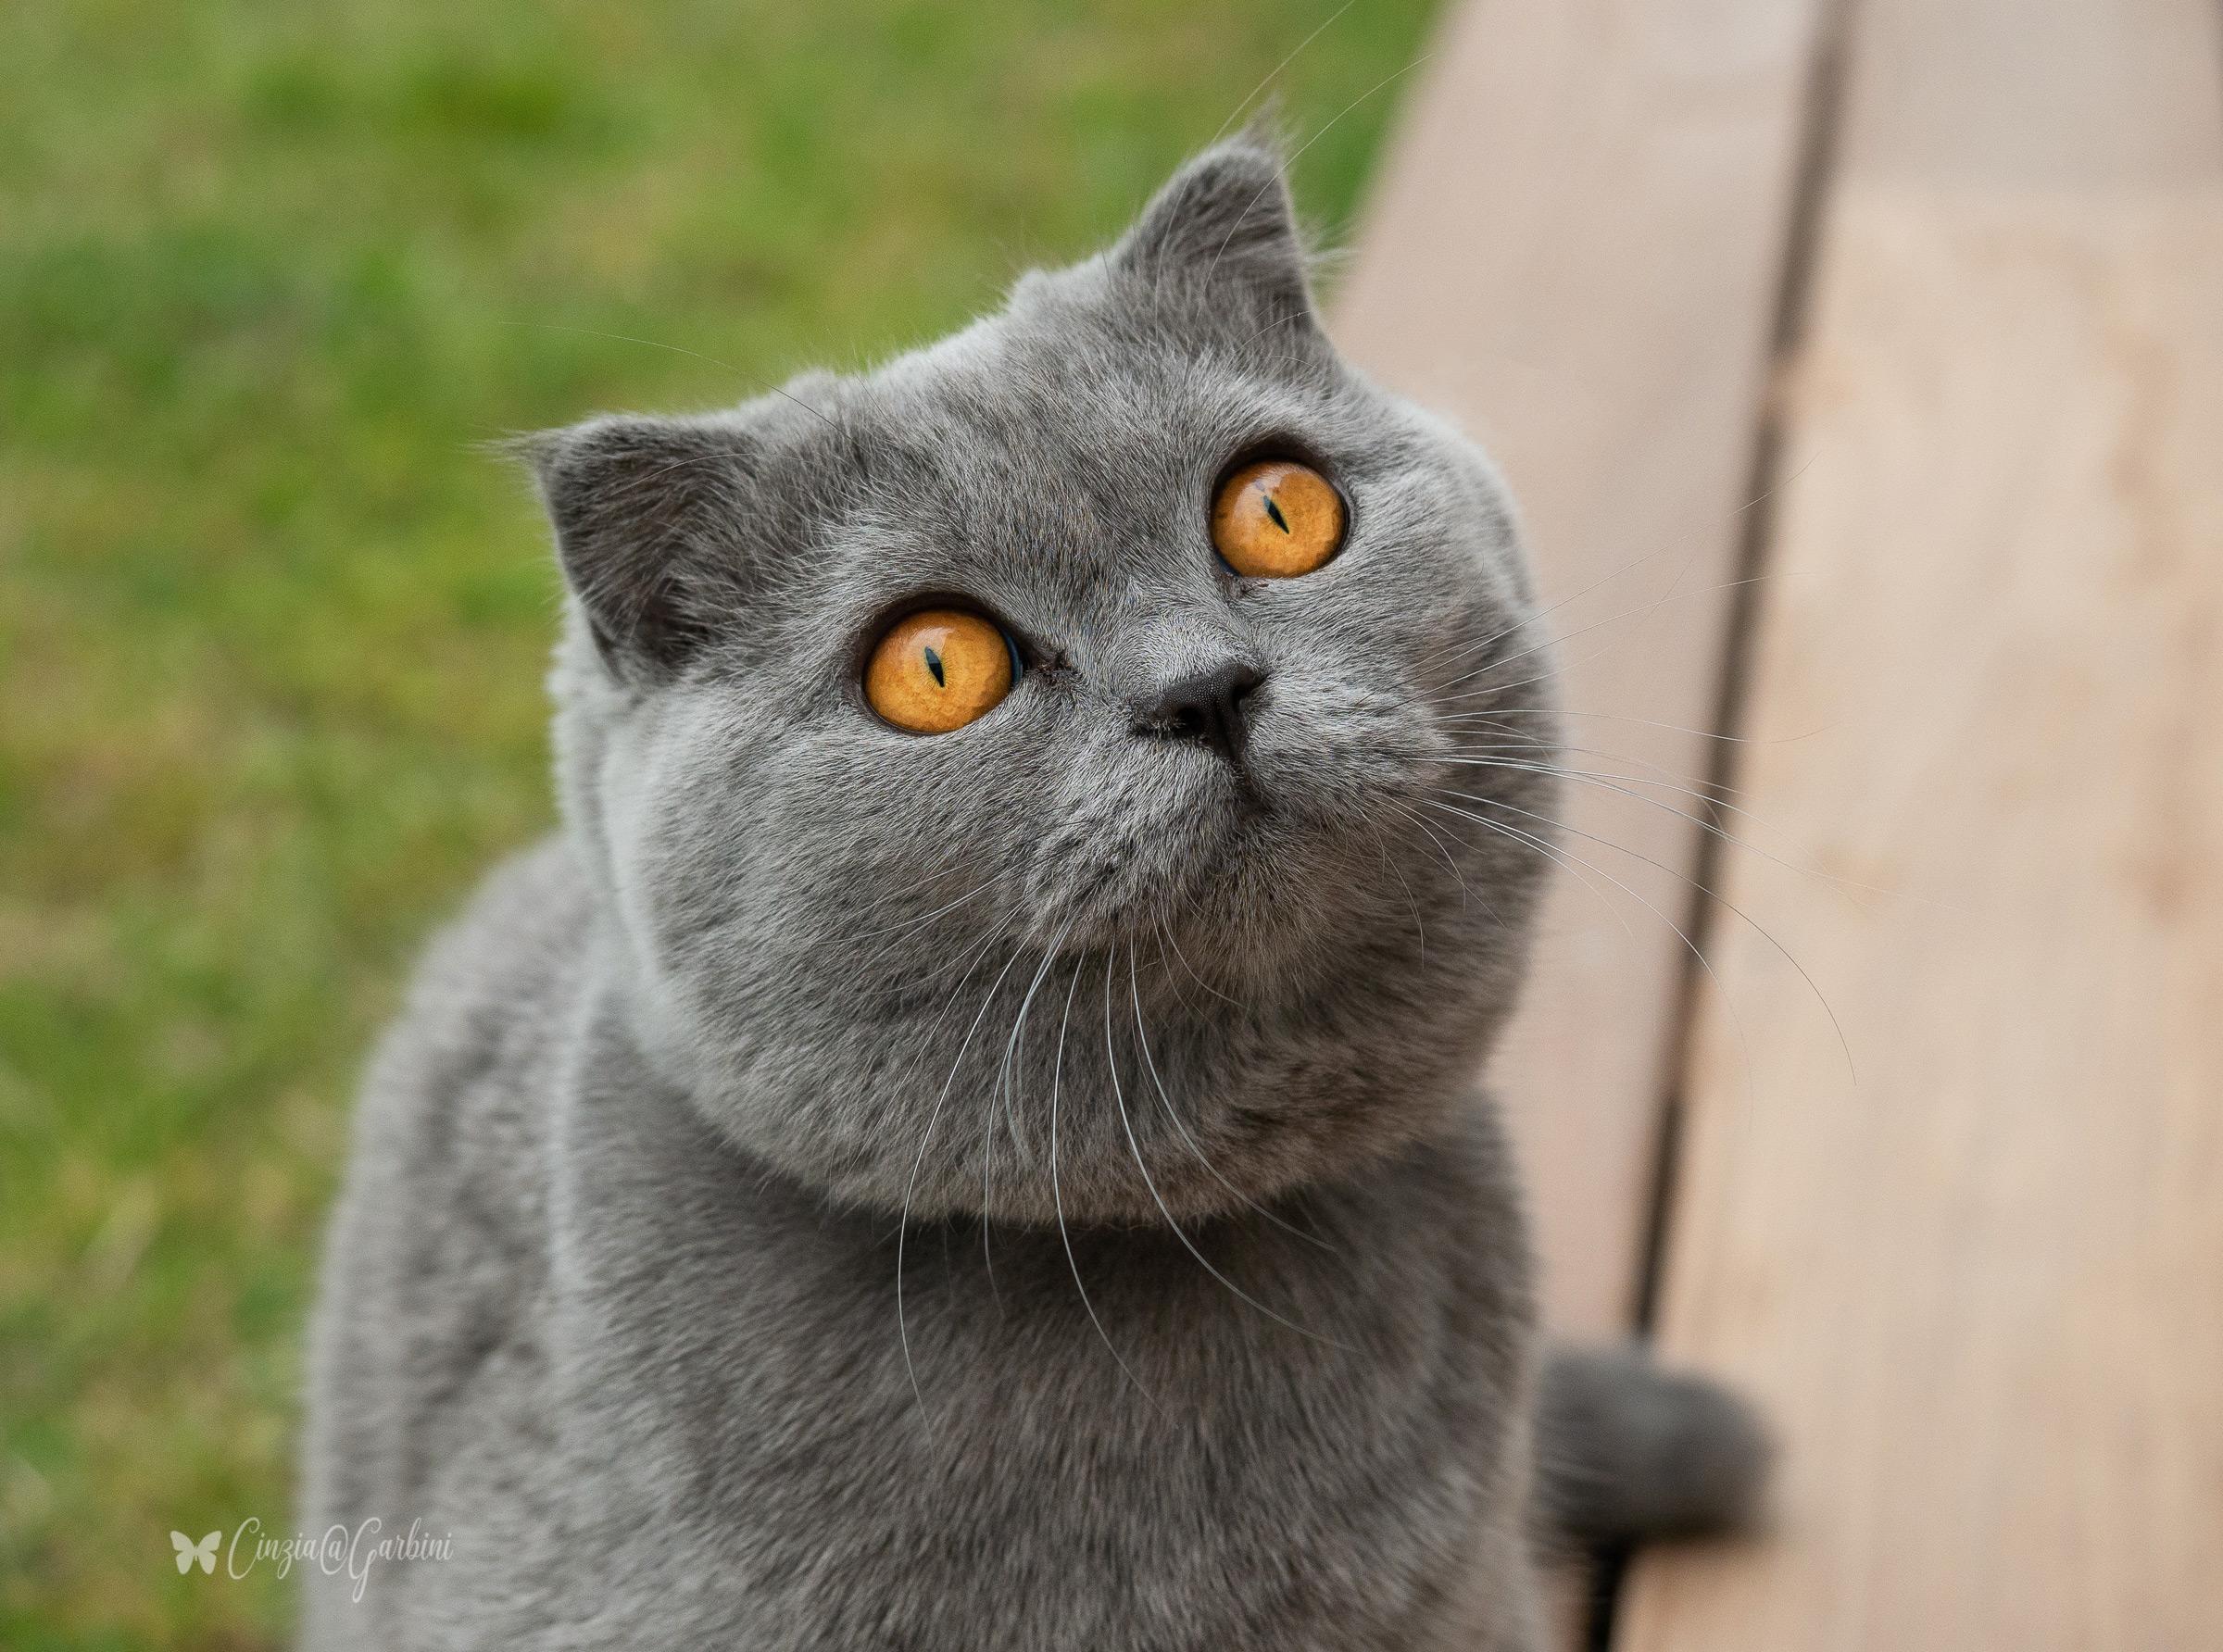 feline curiosity...